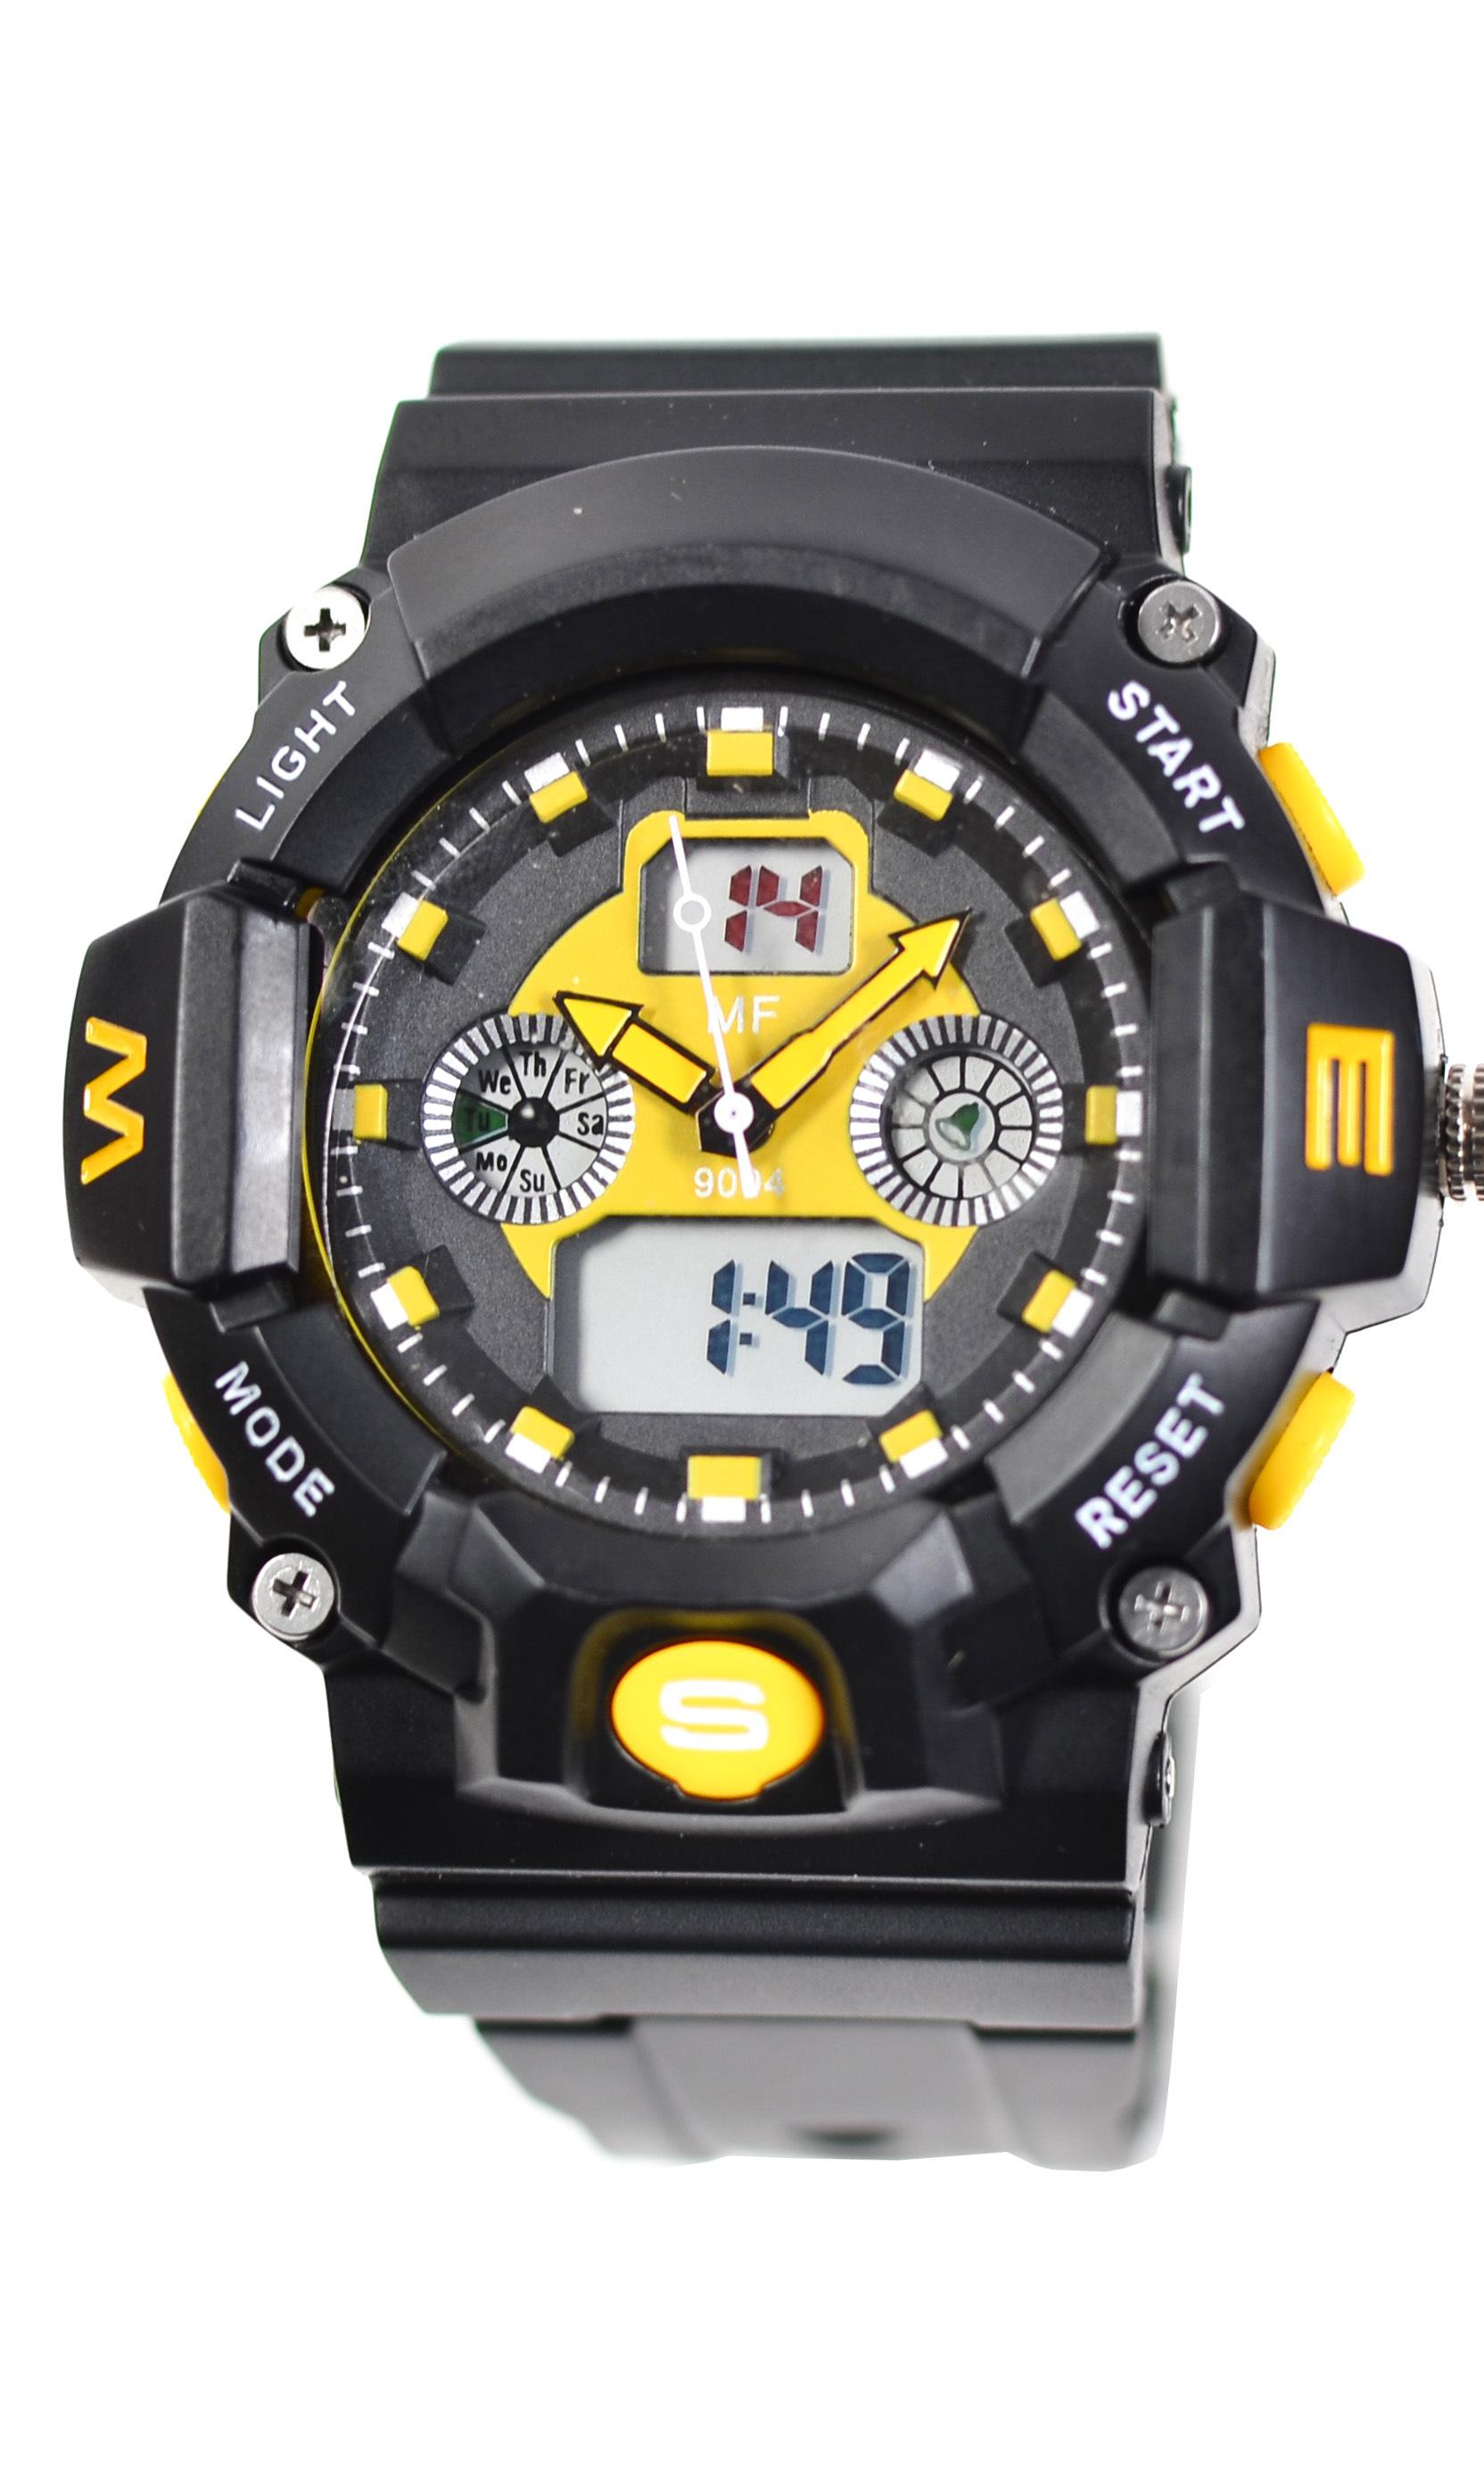 Ceas de mana pentu barbati sport, digitalanalog, negru cu galben - MF9004TG